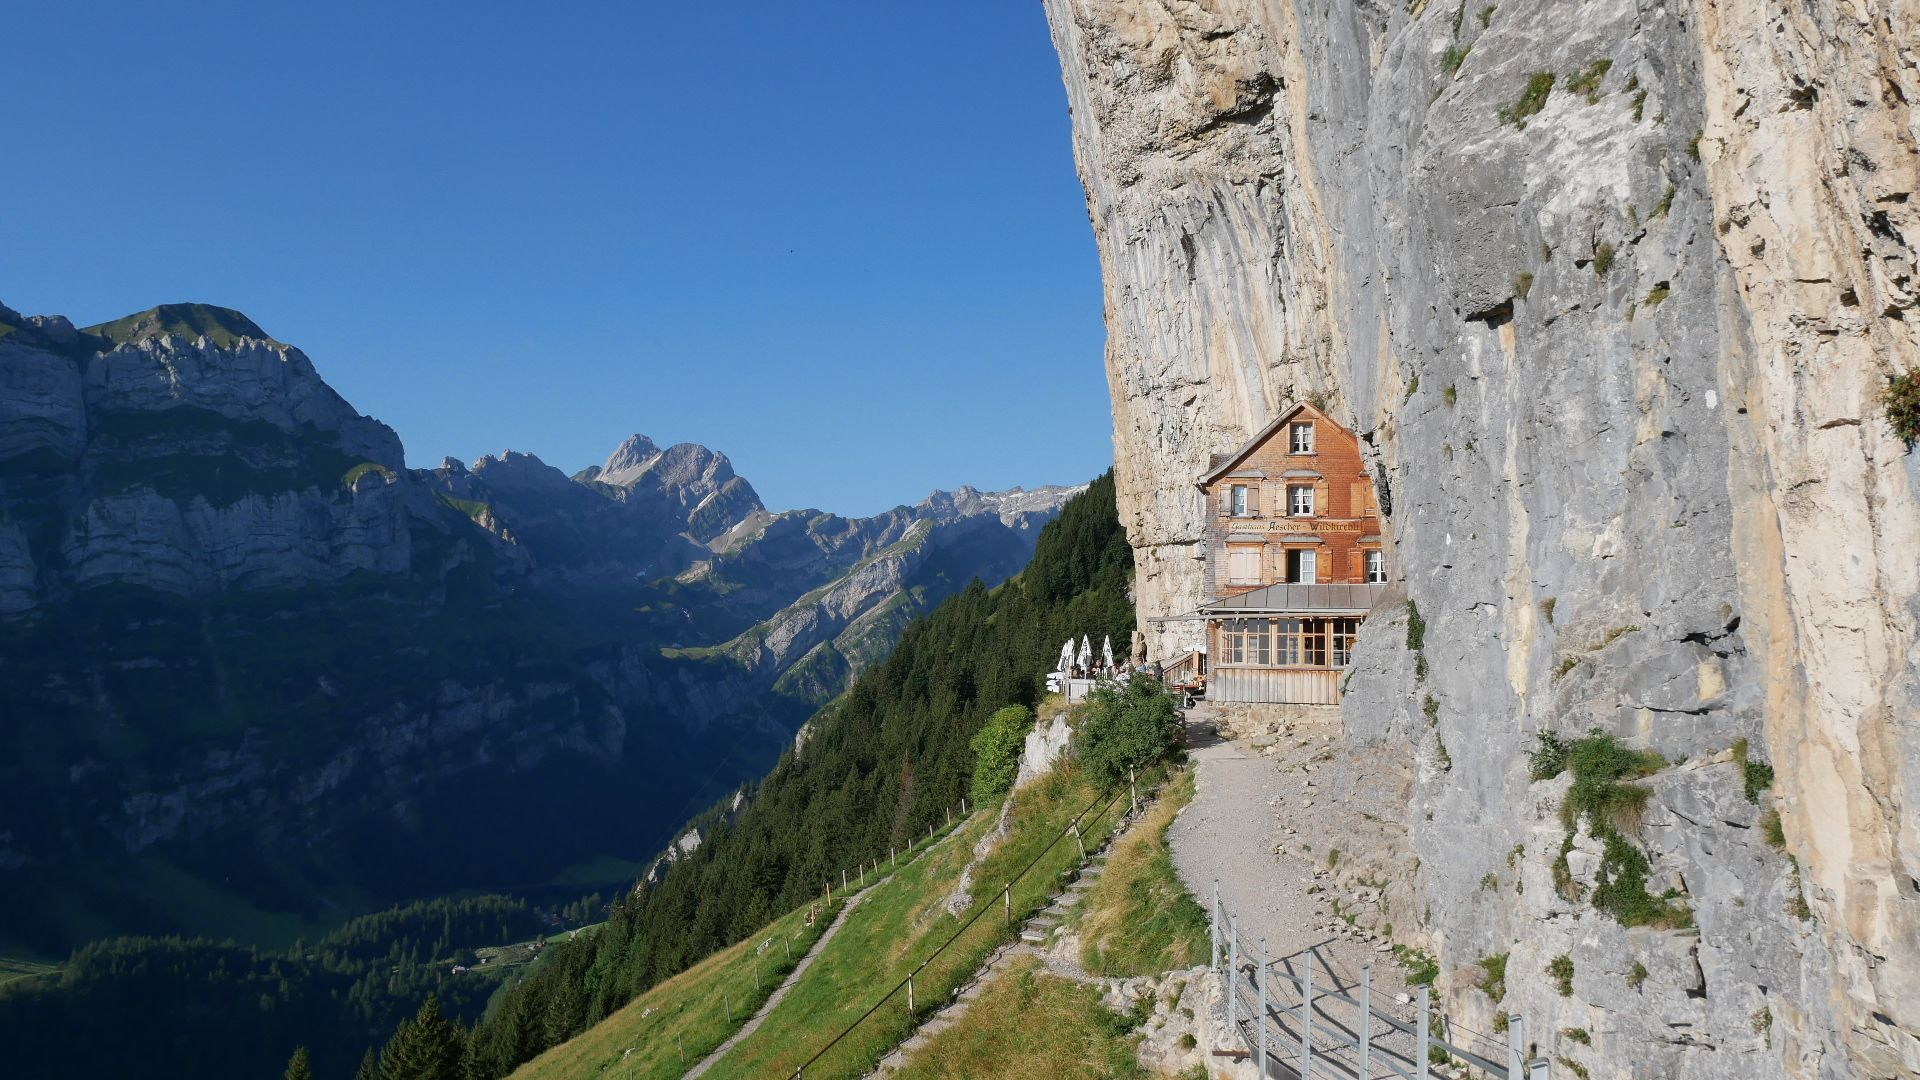 Berggasthaus Aescher Appenzell